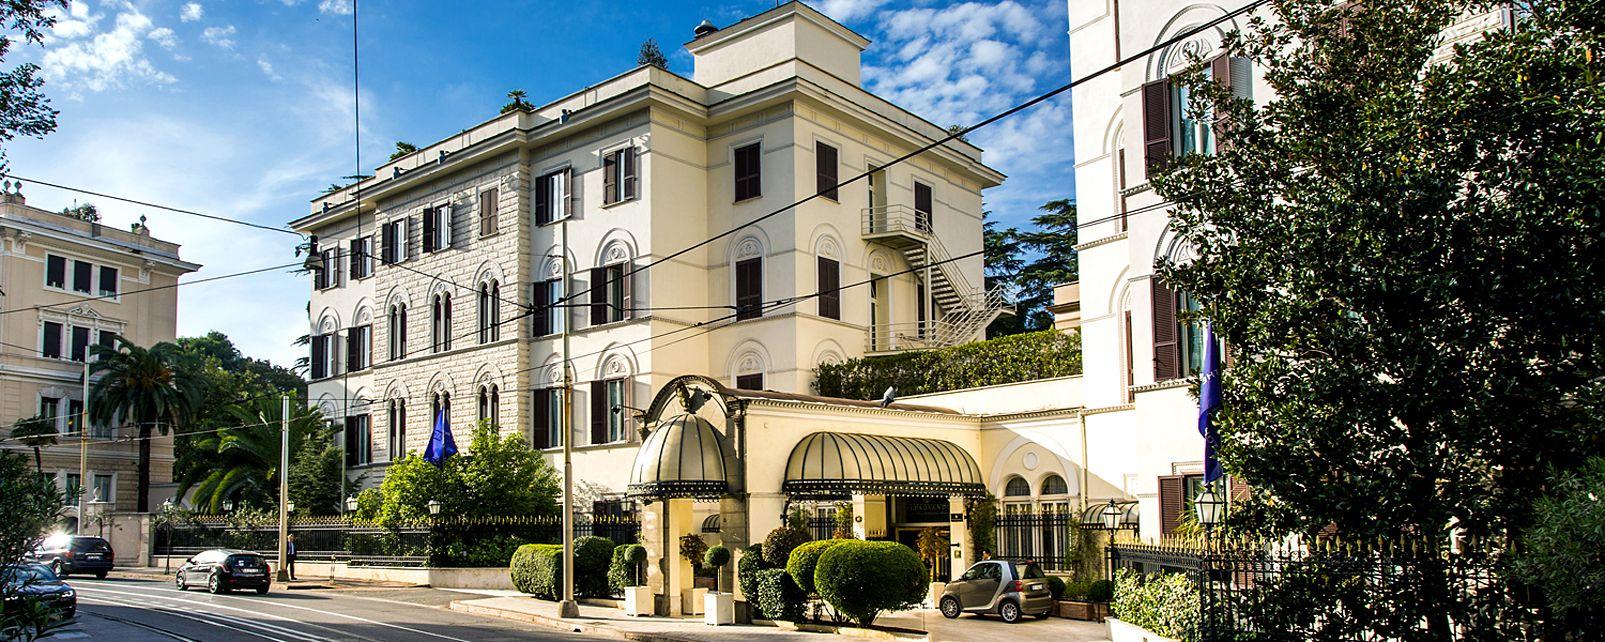 Hotel Aldrovandi Palace